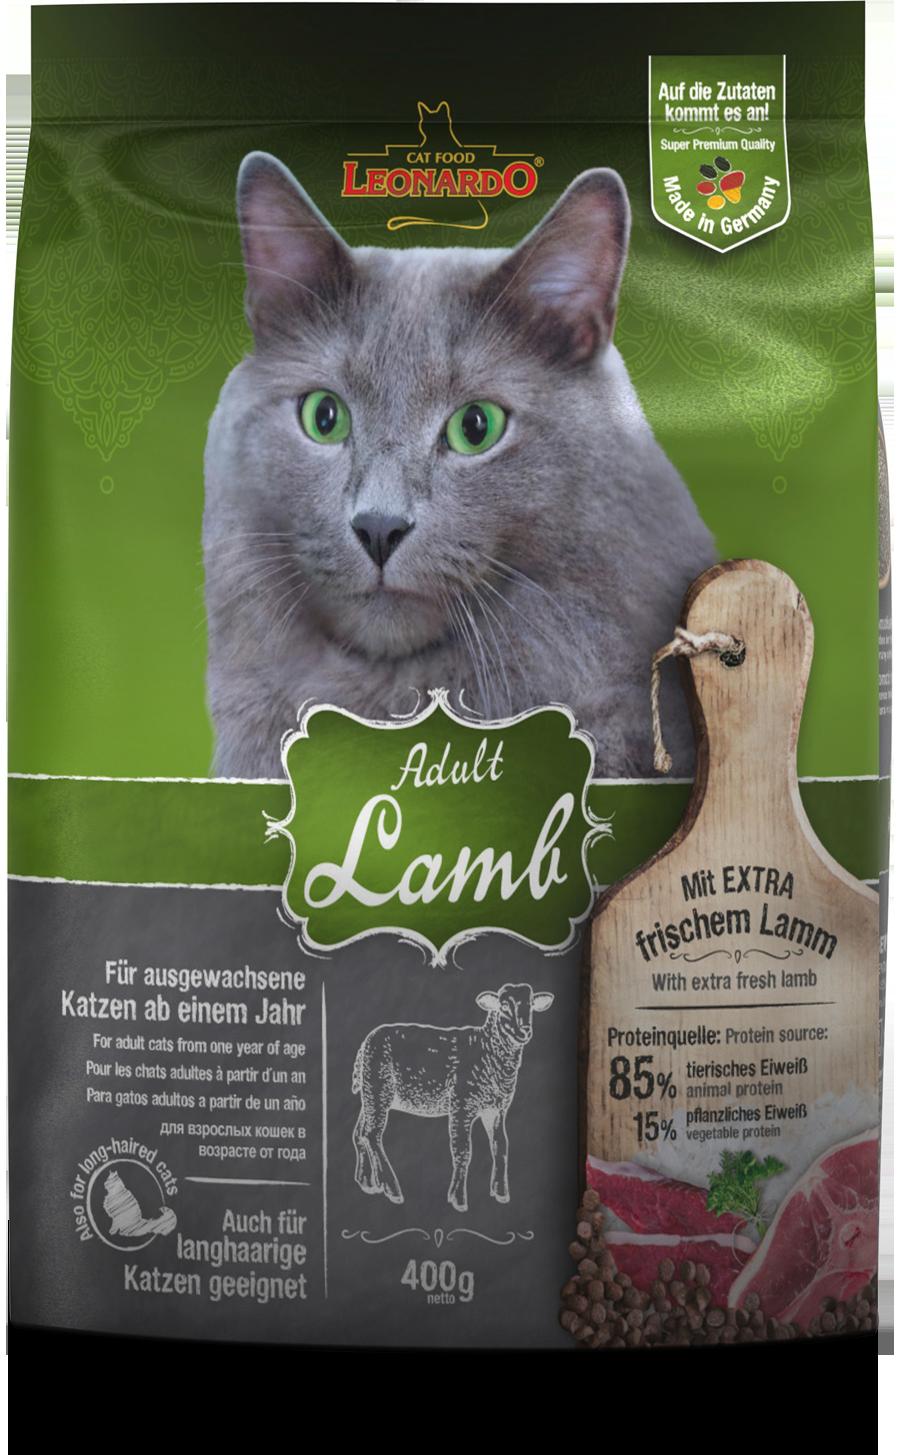 Leonardo-Adult-Lamb-400g-front